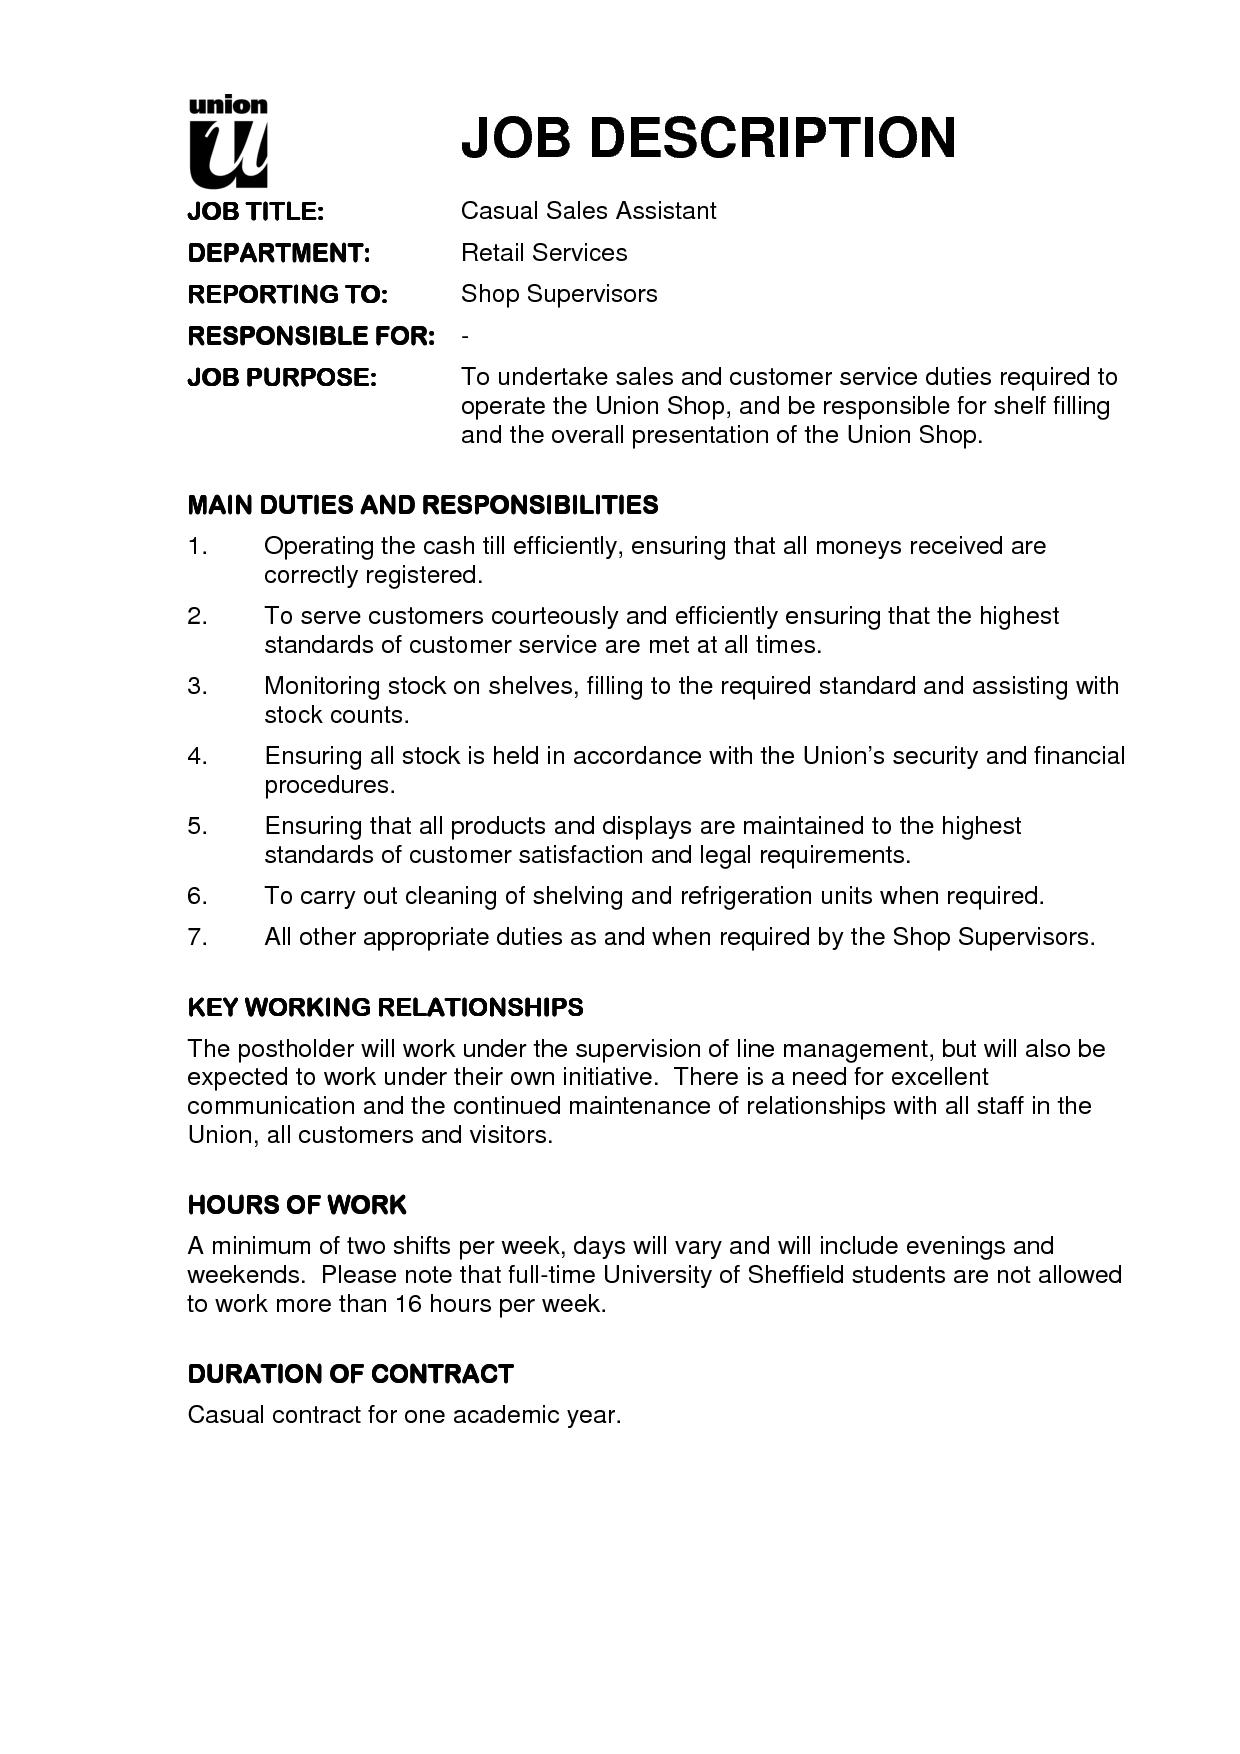 Cashier Job Description For Resume Mesmerizing Resume Examples Job Descriptions | Resume Examples | Pinterest Decorating Inspiration